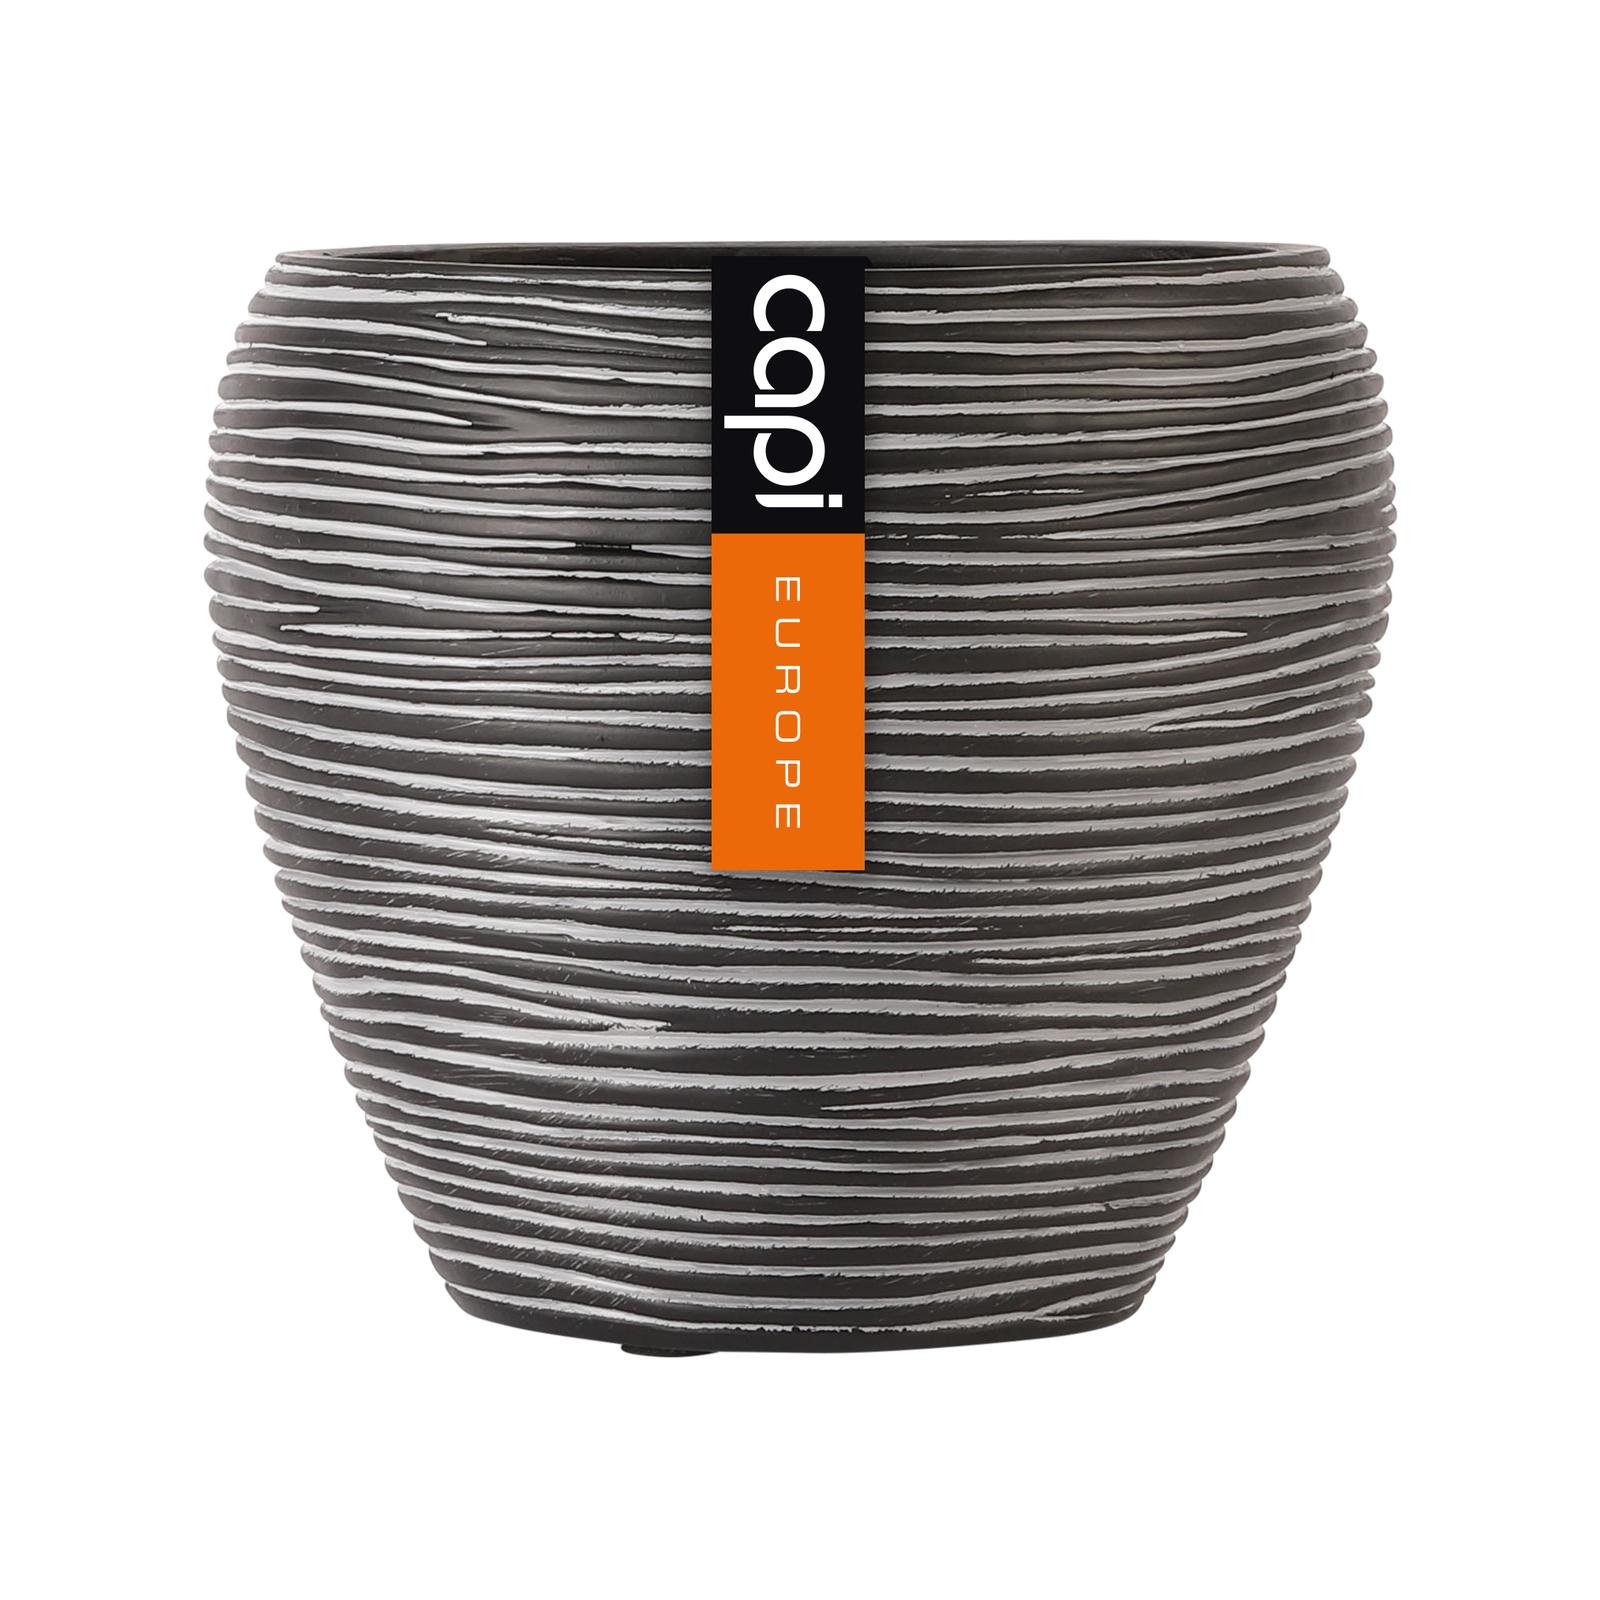 Capi 15 x 13cm Black Rib Round Vase